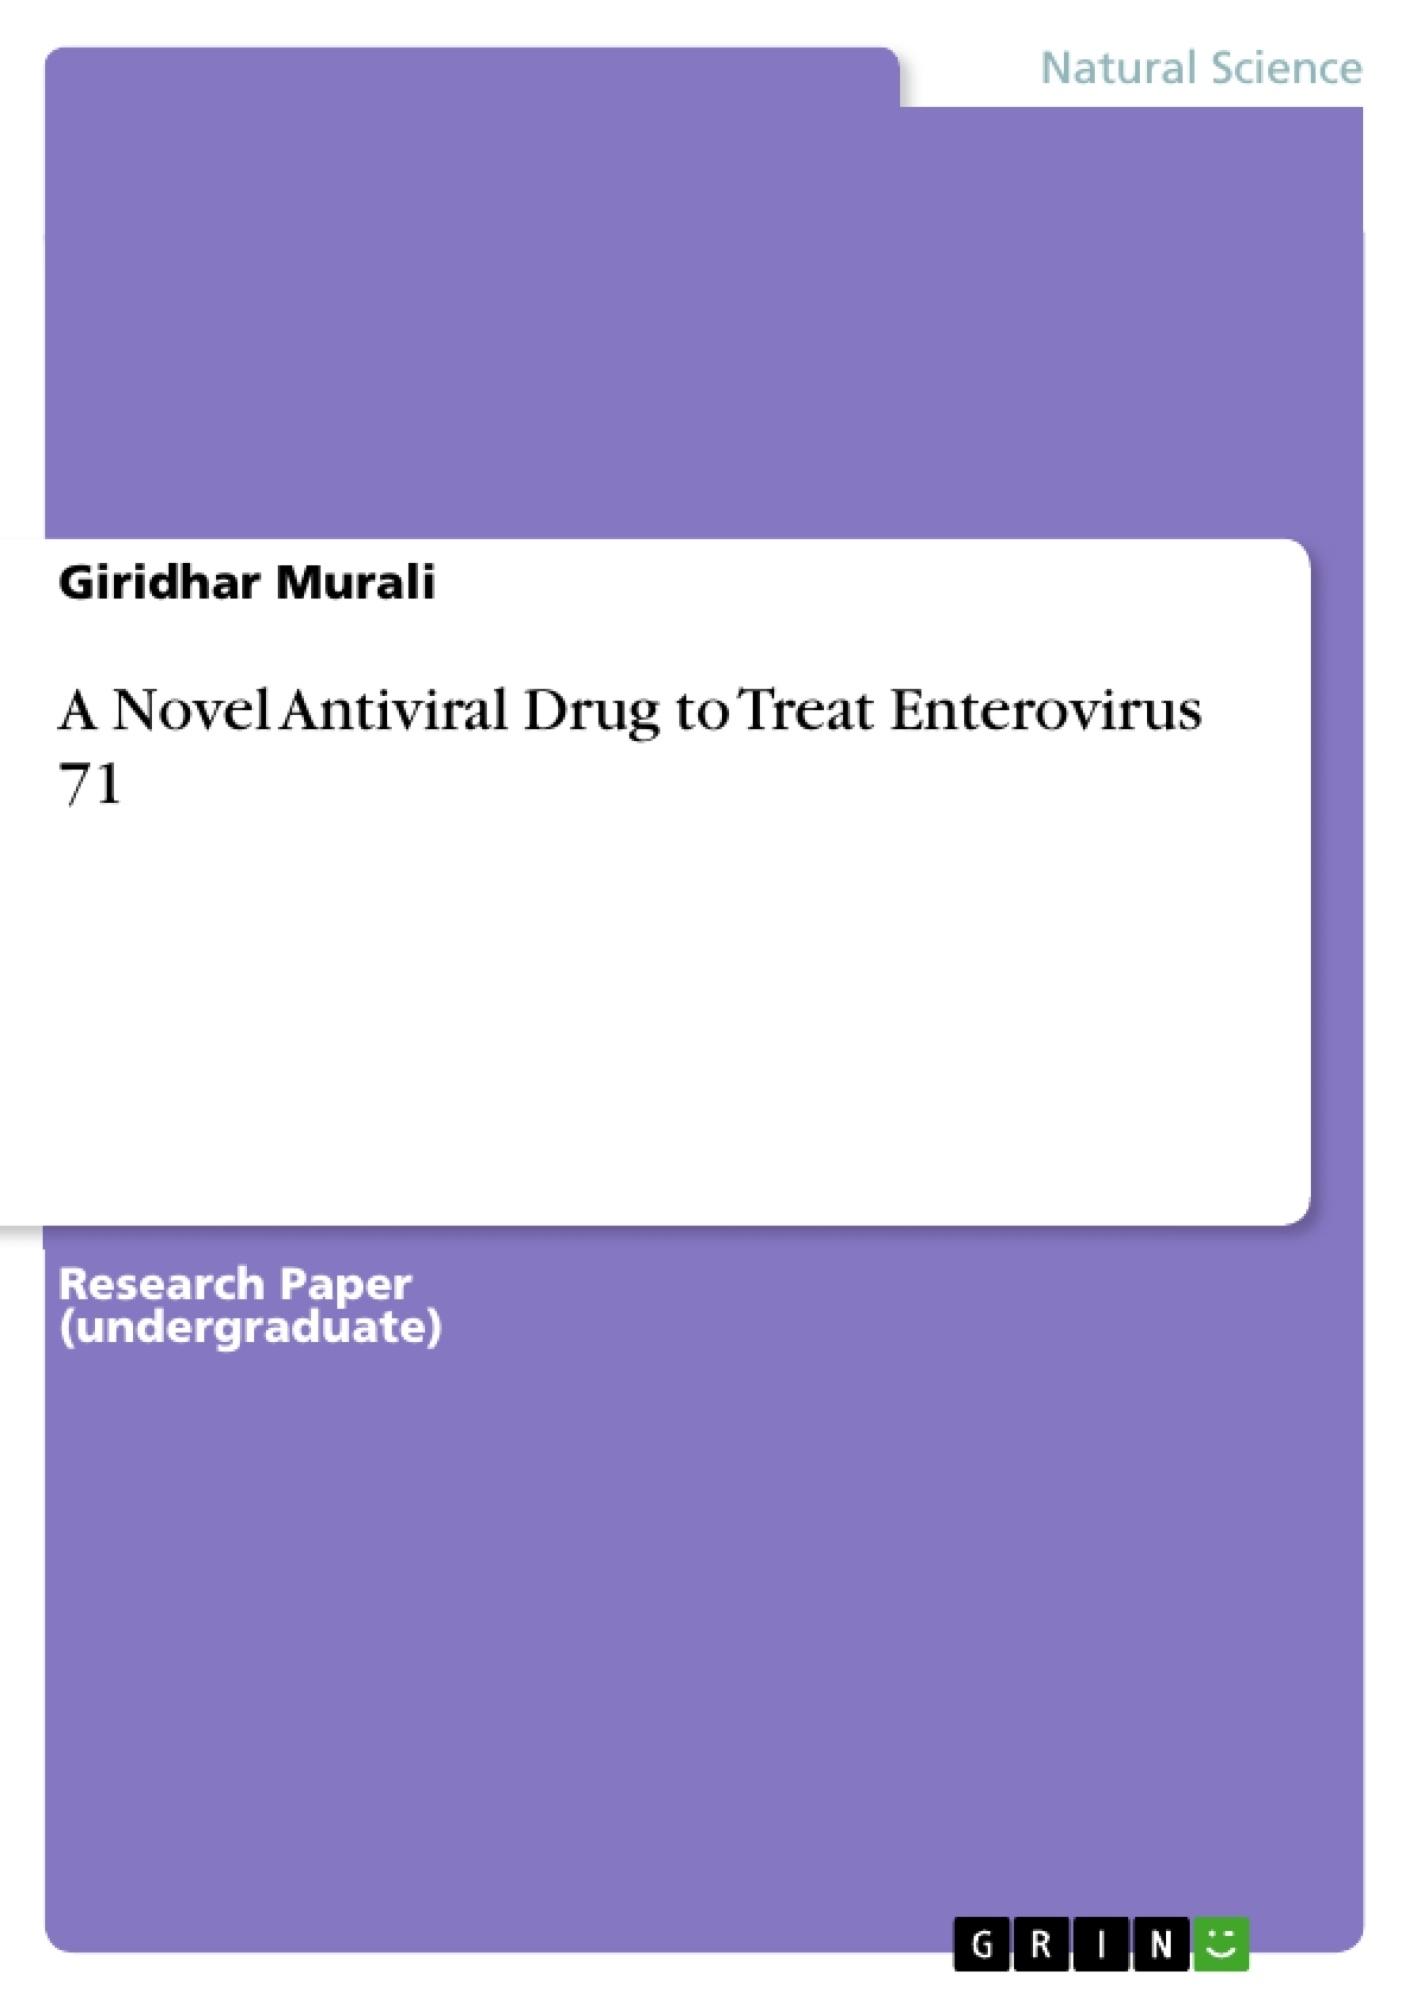 Title: A Novel Antiviral Drug to Treat Enterovirus 71